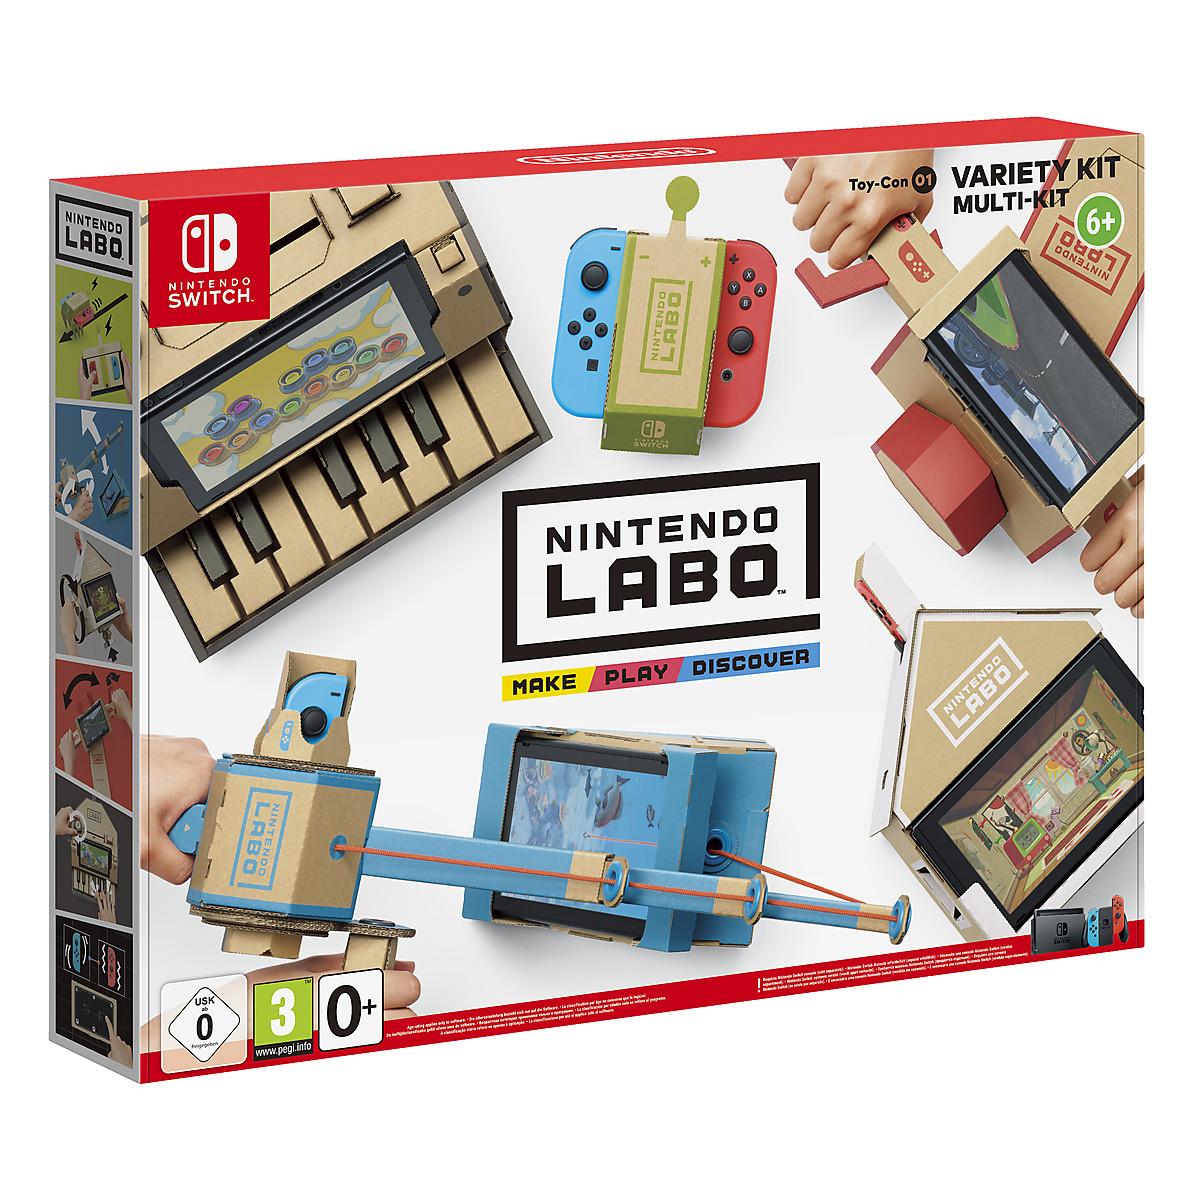 Toy-Con 01: Variety Kit Nintendo Labo spel till Nintendo Switch